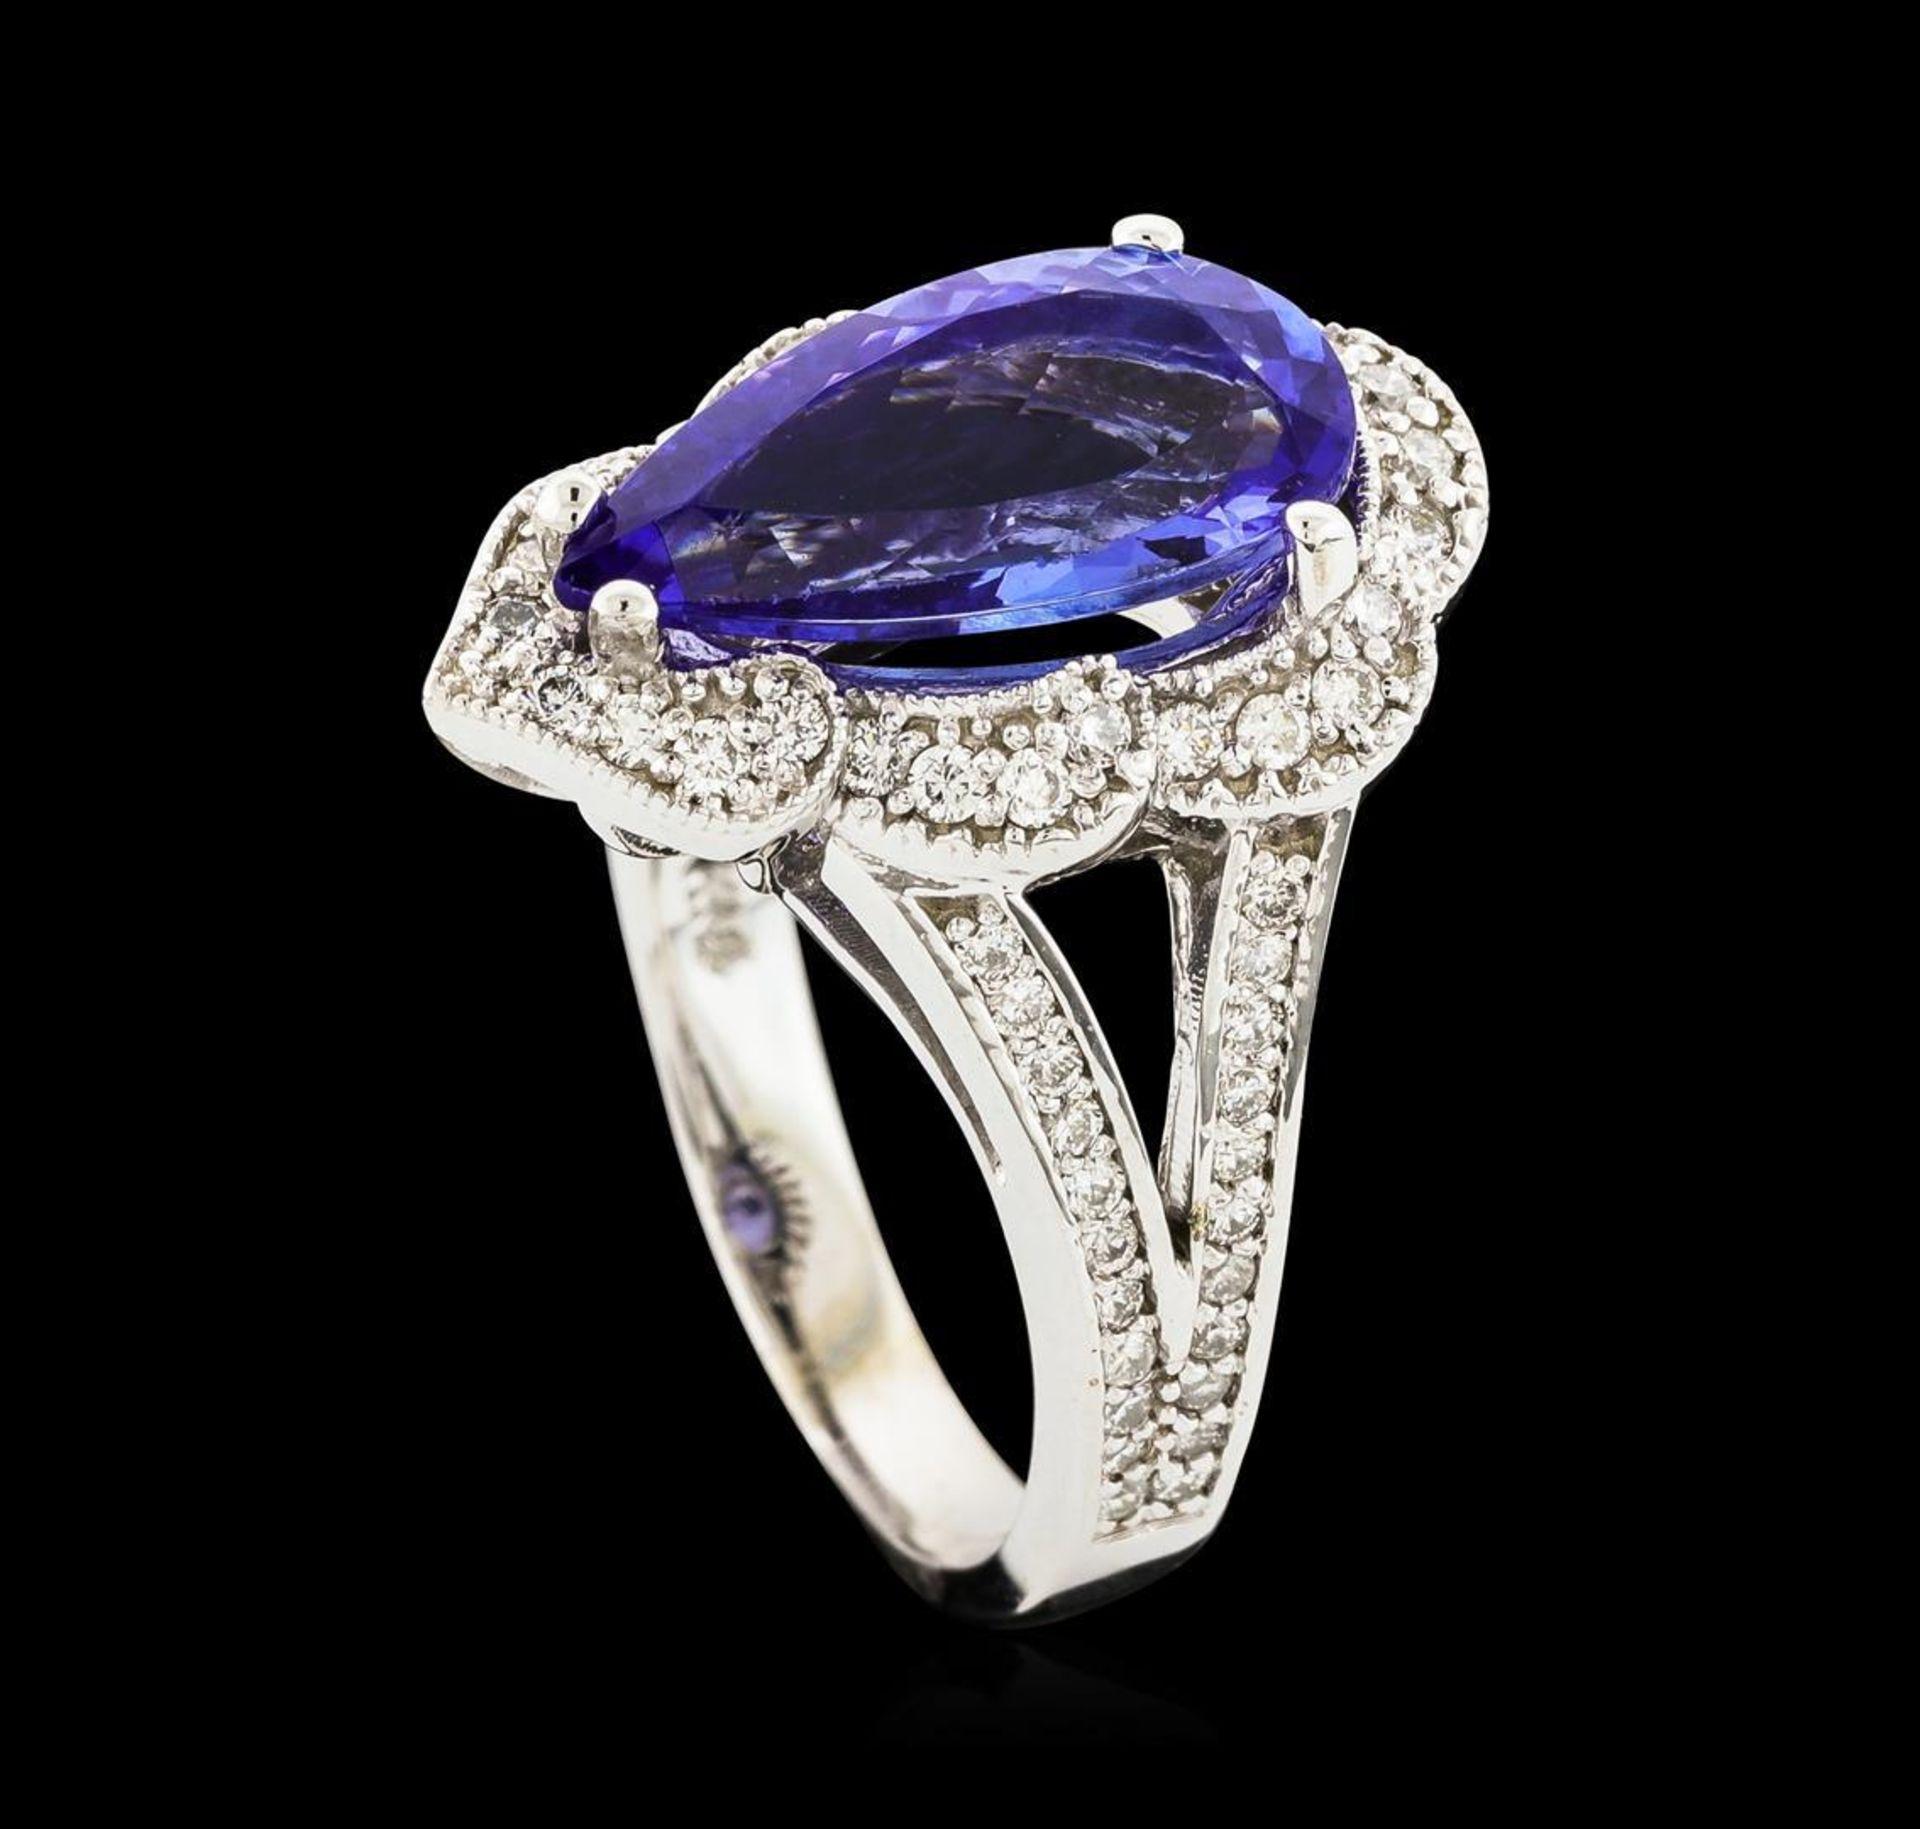 3.40 ctw Tanzanite and Diamond Ring - 14KT White Gold - Image 4 of 5